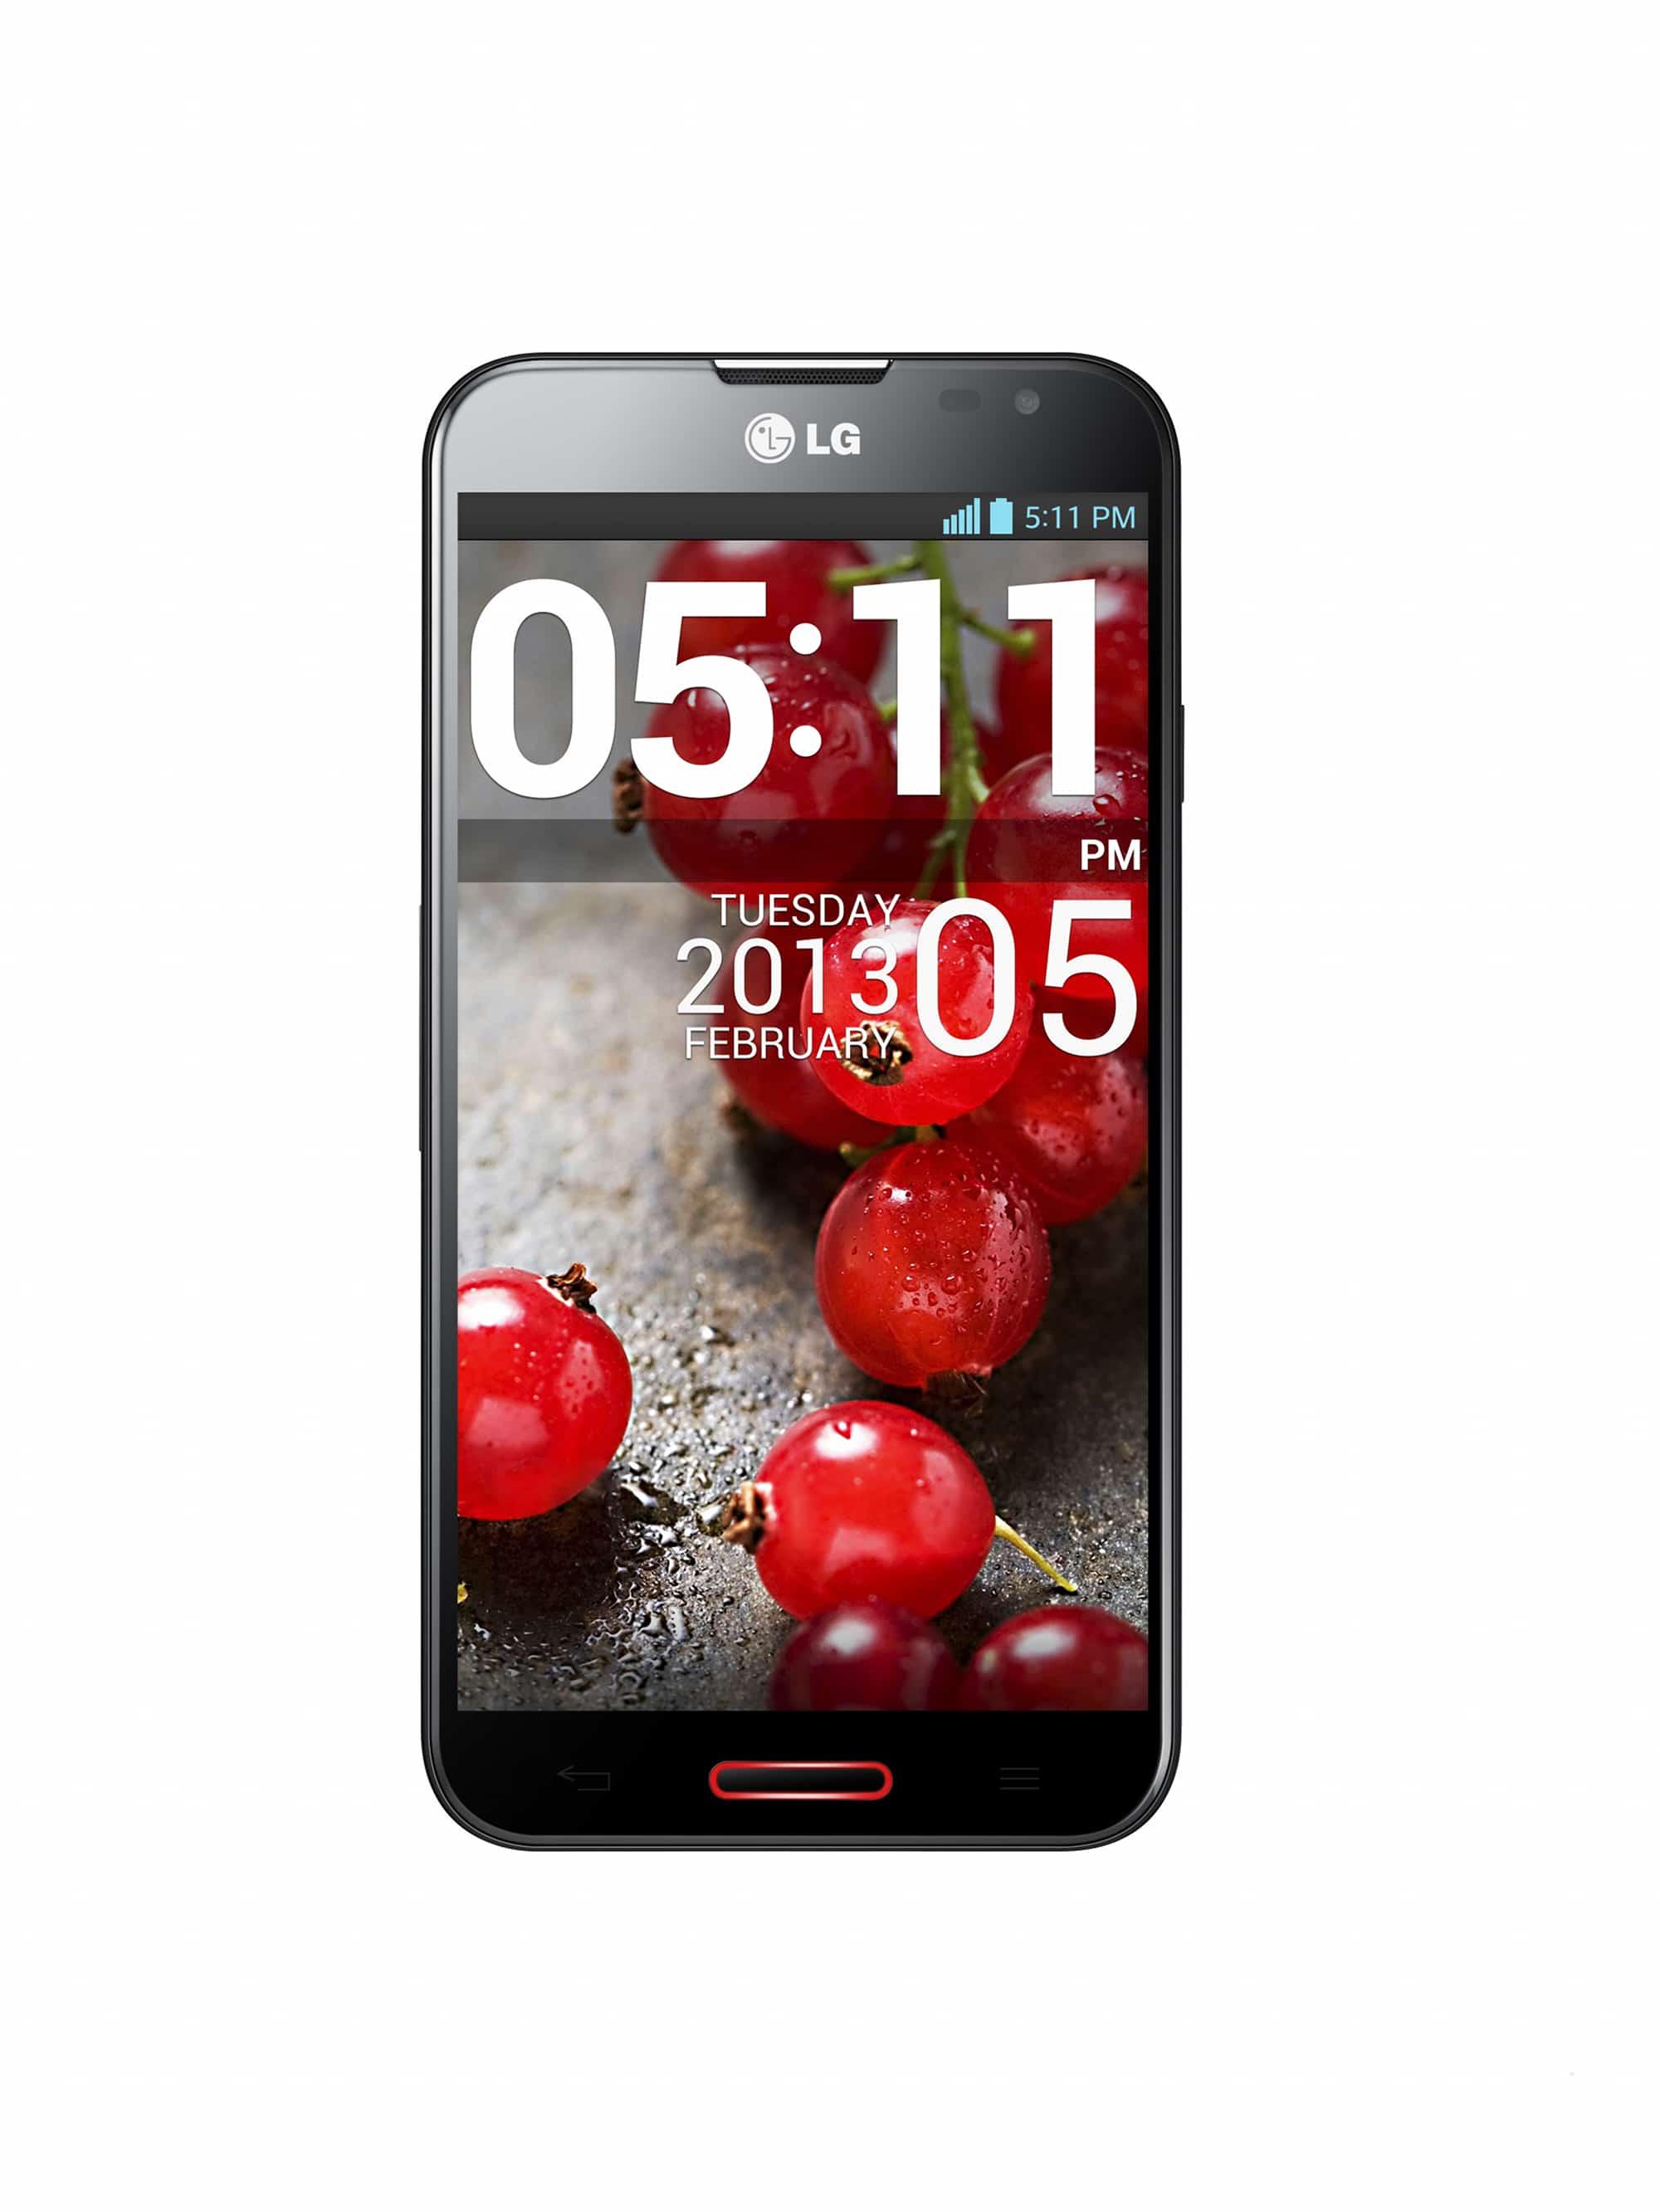 LG optimusG Pro